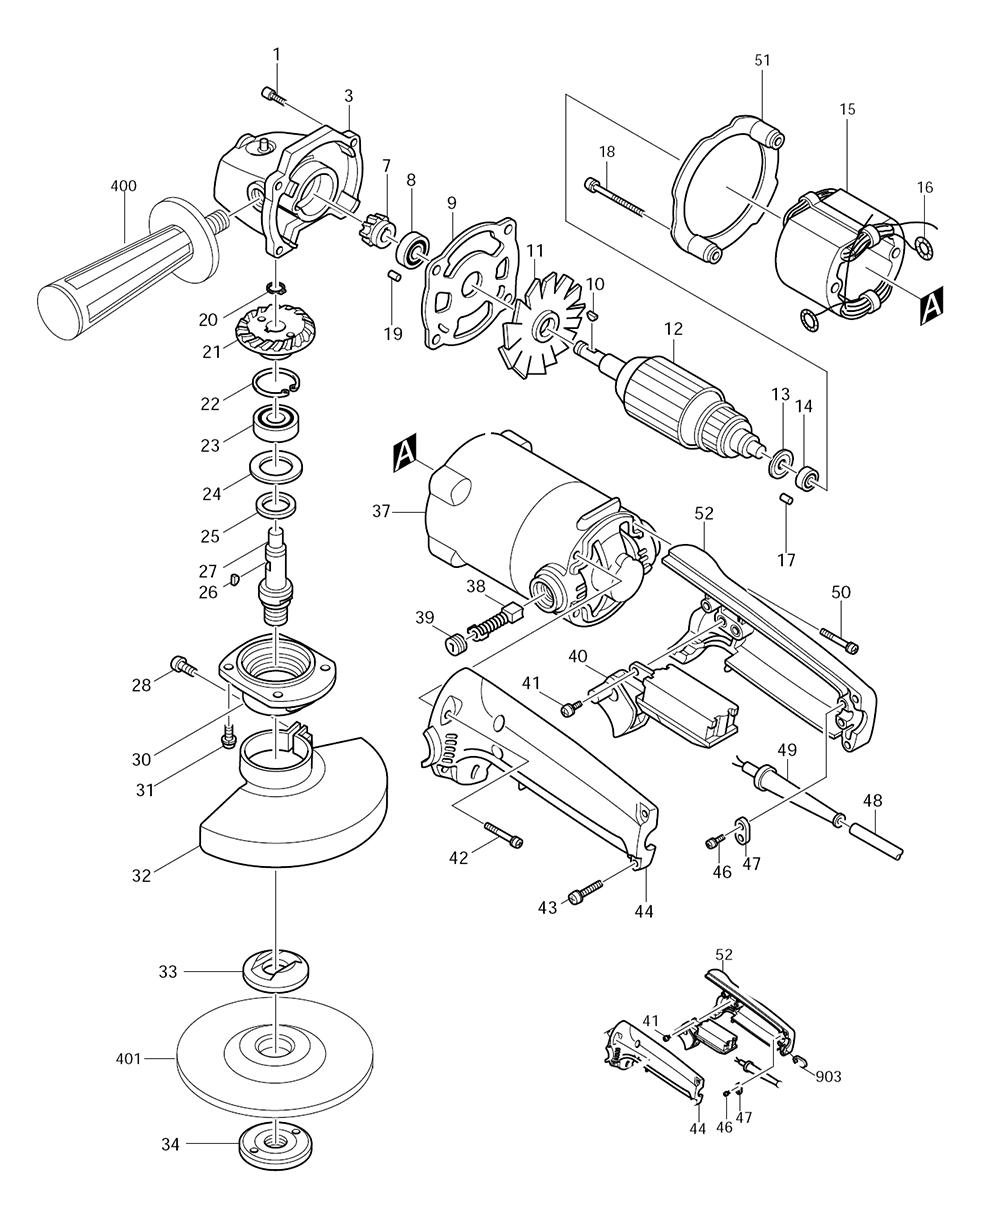 Makita 9005b Parts List